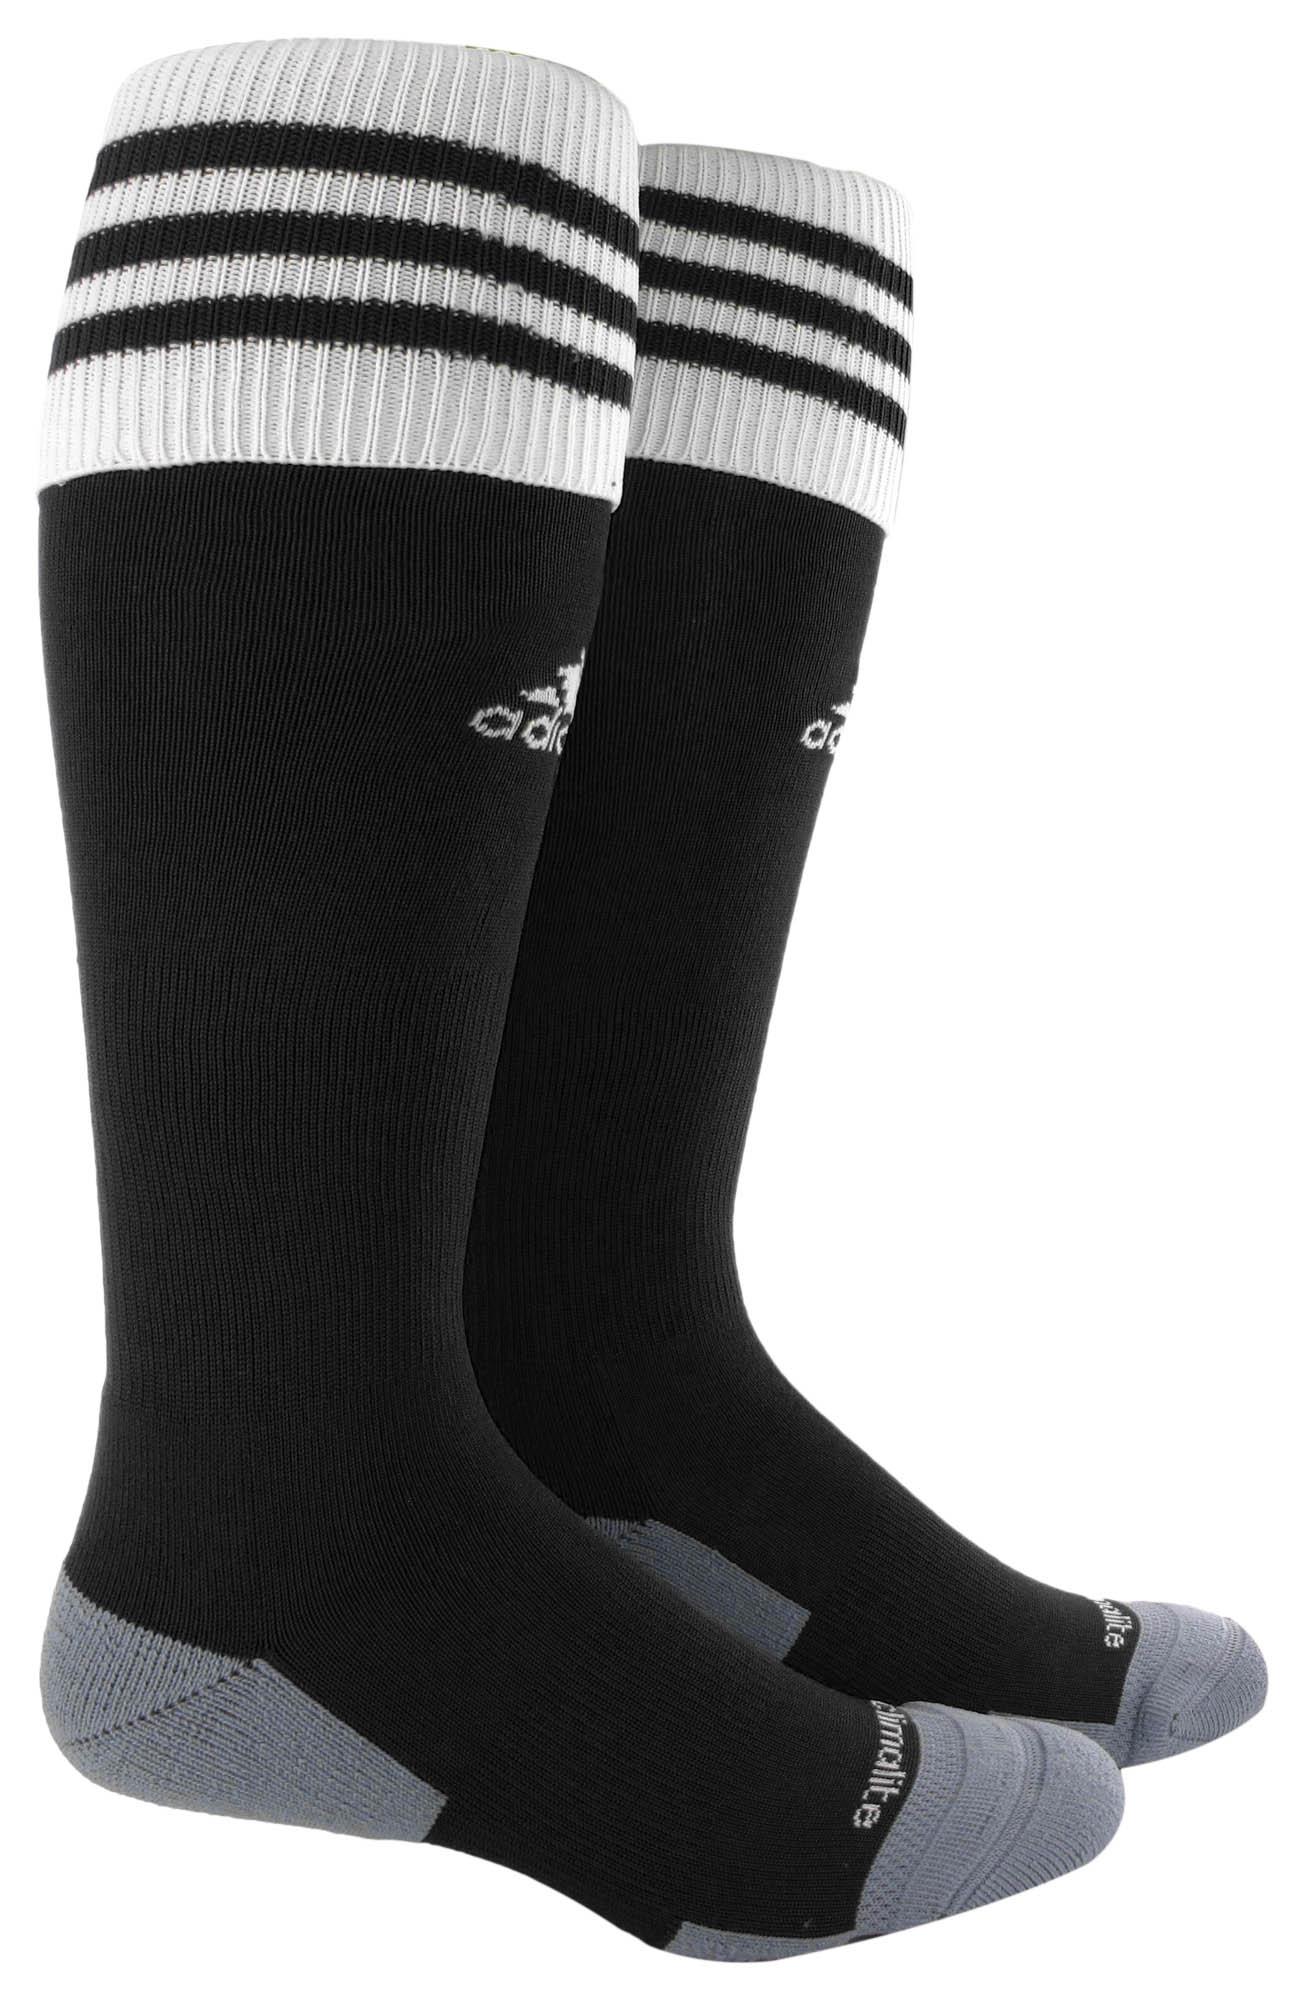 51c6fc3ae484 adidas Copa Zone Cushion II Soccer Sock - SoccerPro